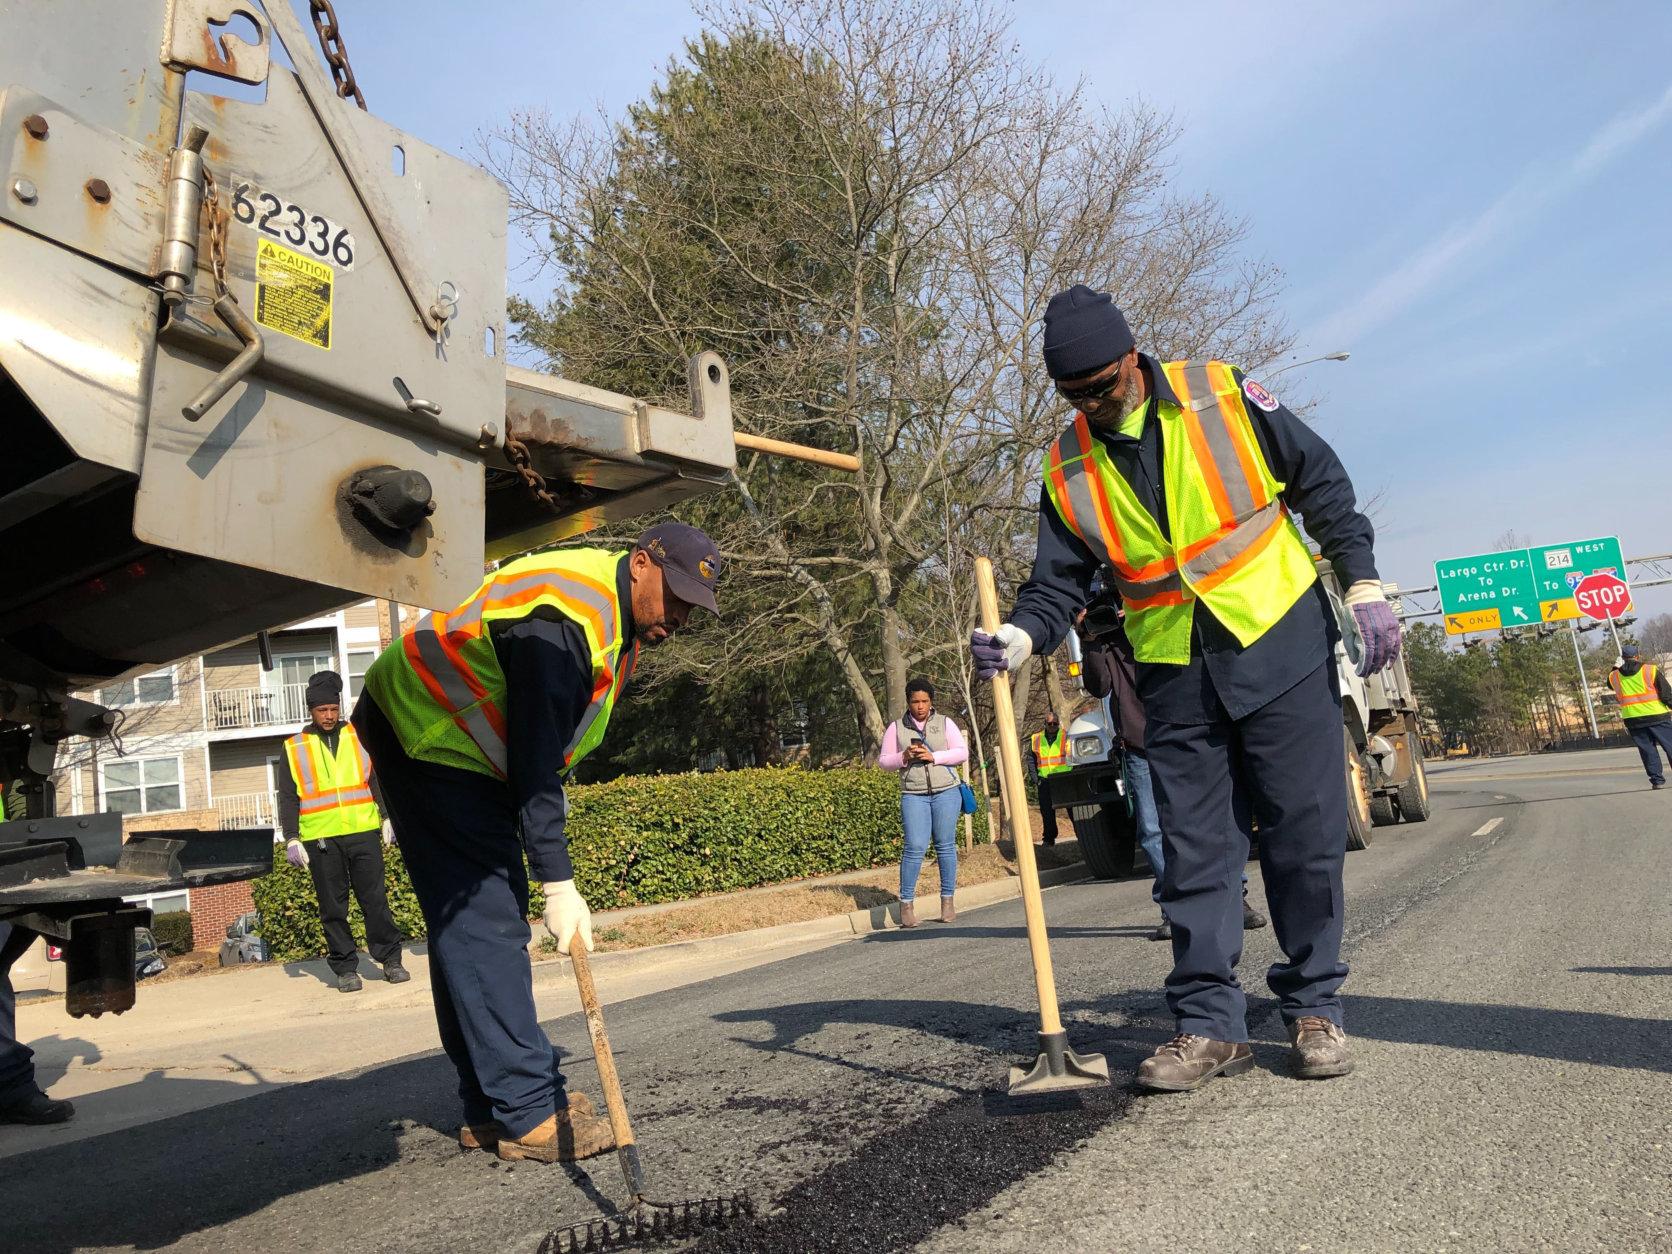 The county fills 16,000 potholes a year on average, Jones said. (WTOP/Kristi King)